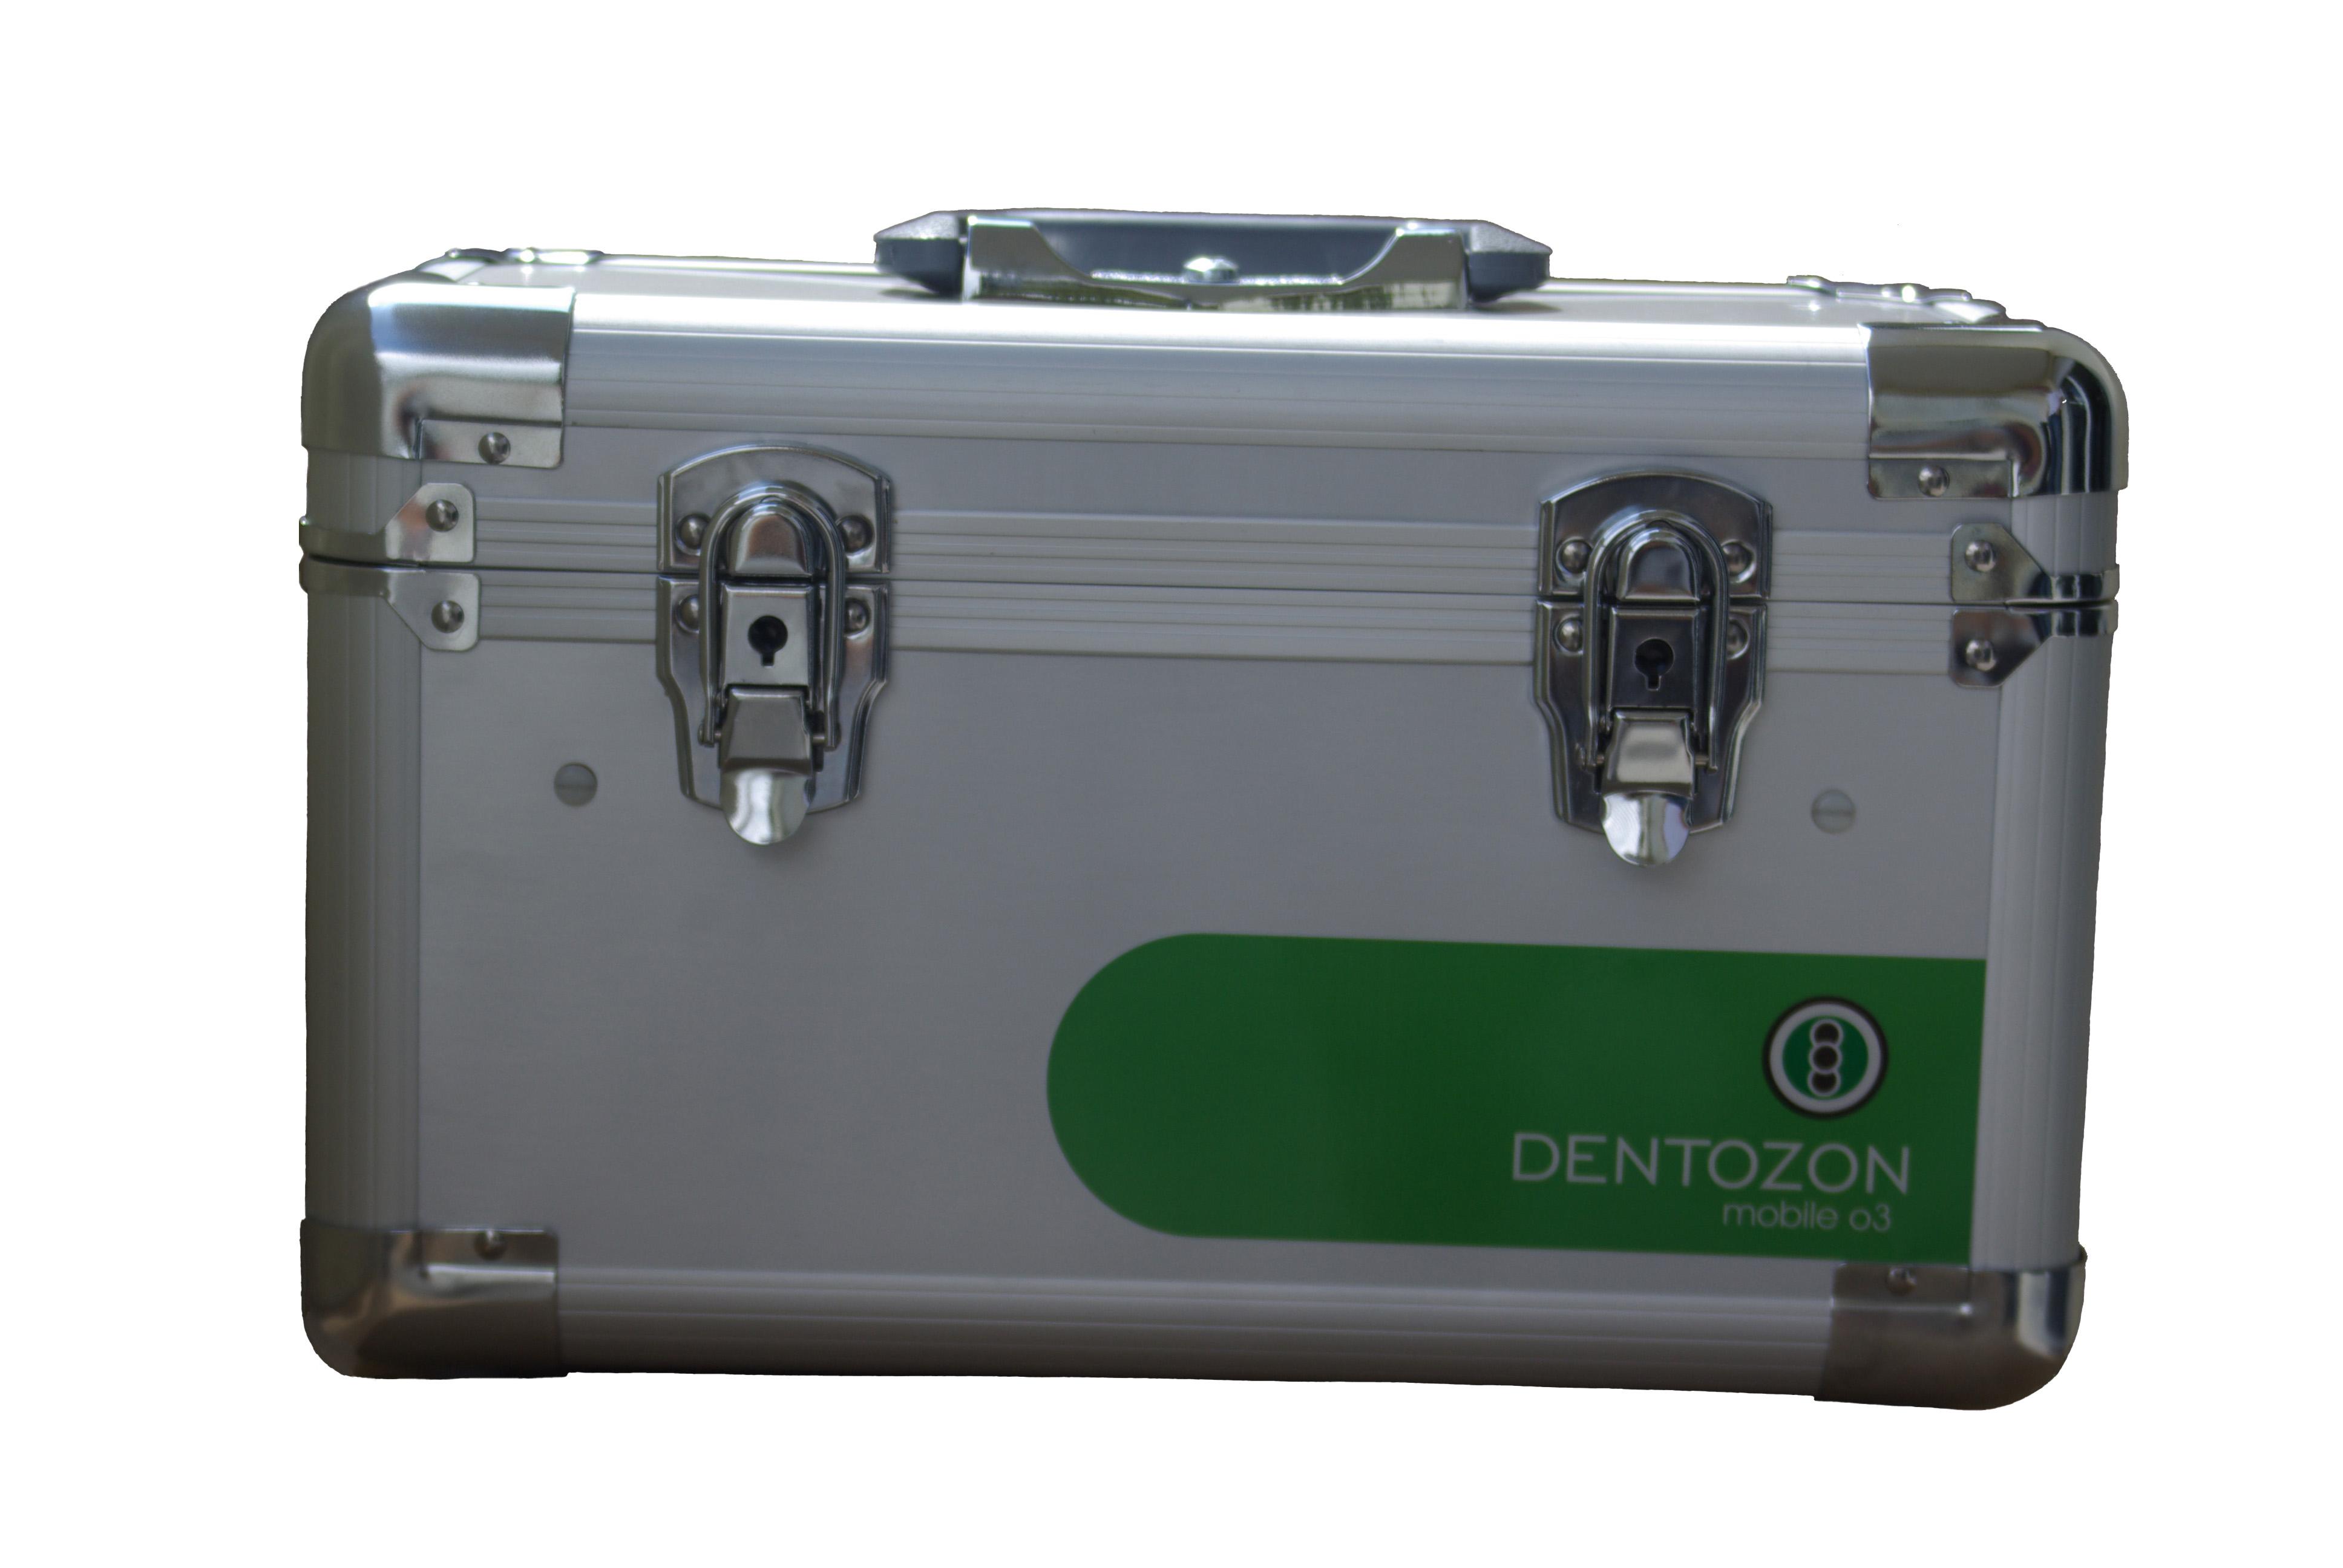 Dentozon, Silbersocken